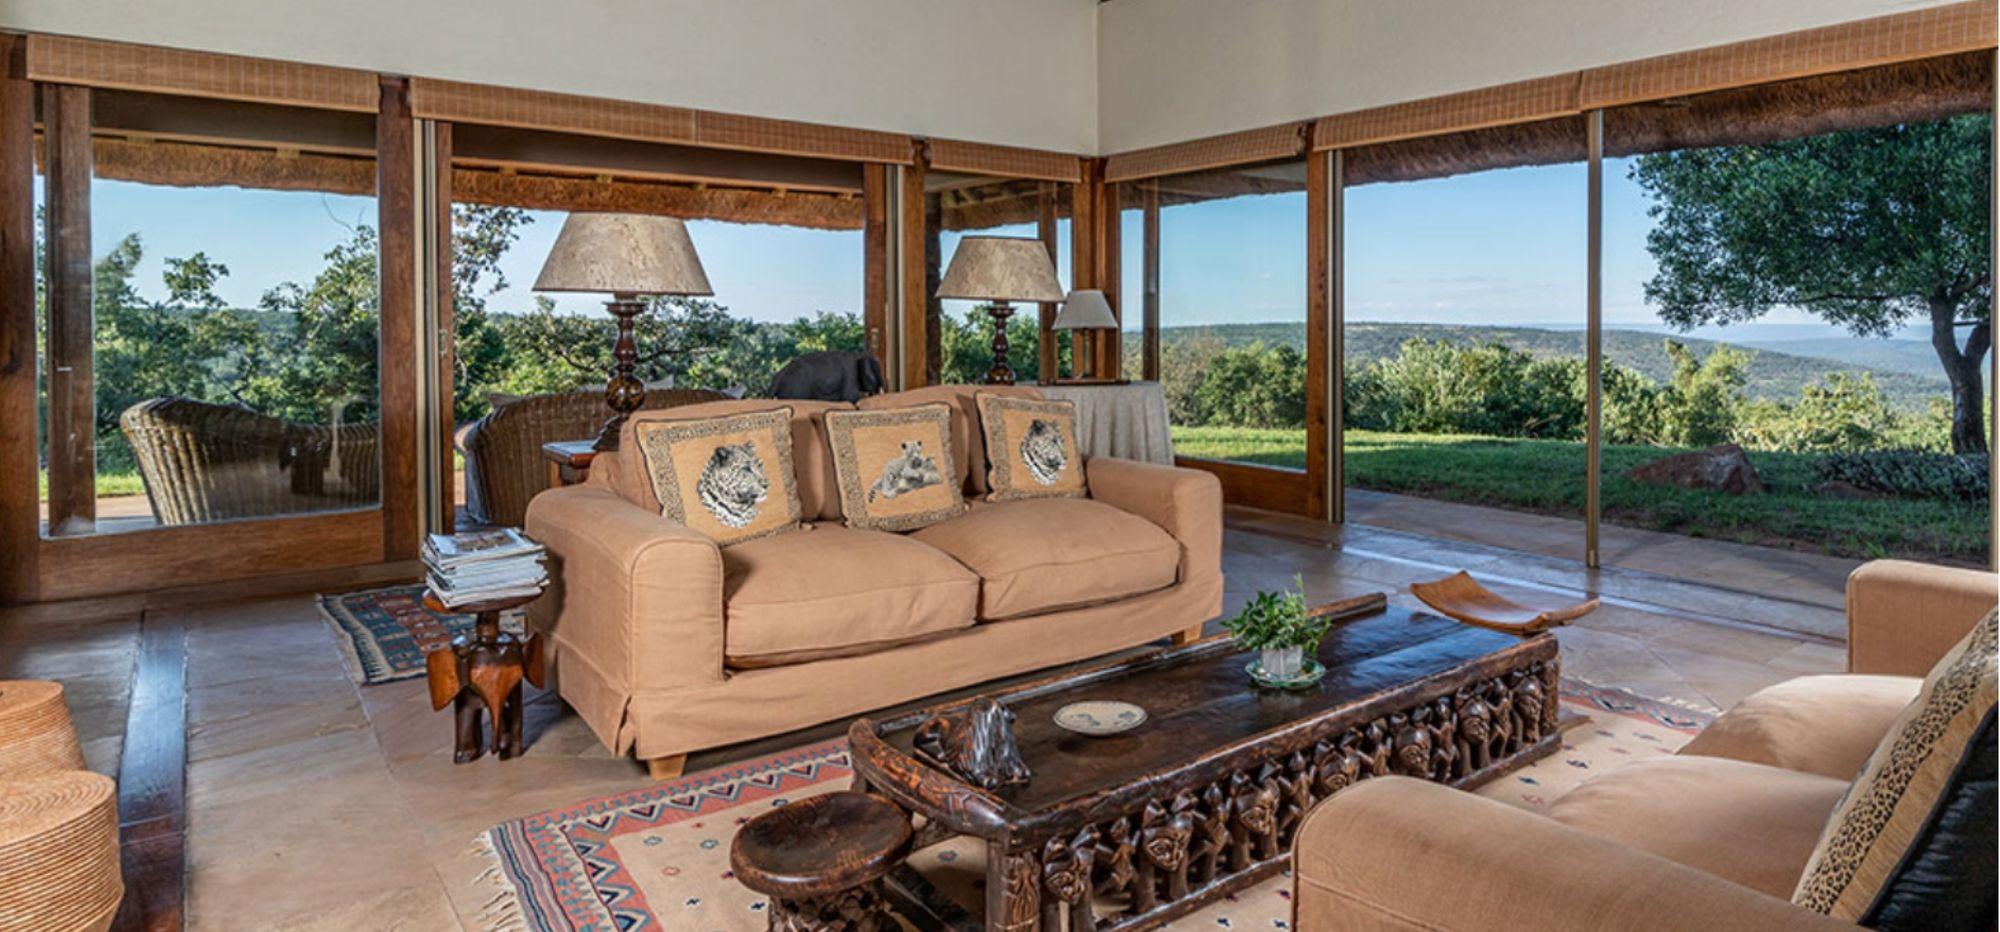 Lodge Accommodation on Alexandra's Africa Safari